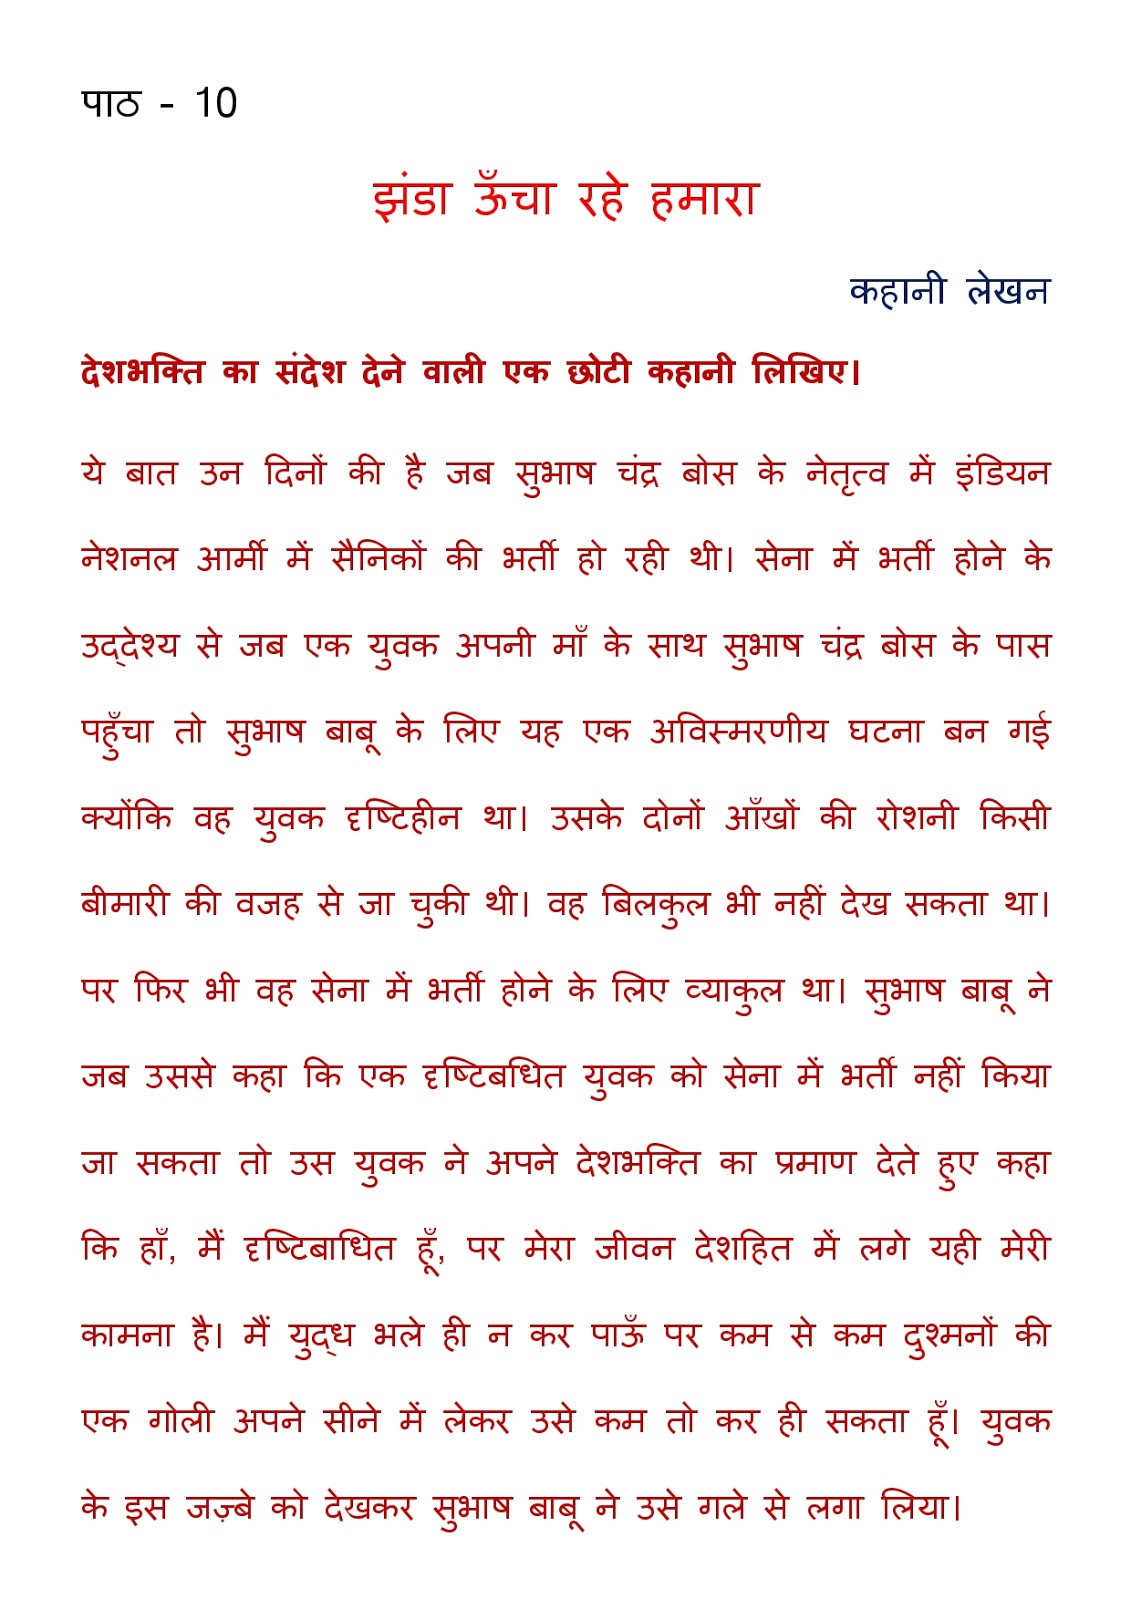 Class Vii Chapter 10 Jhanda Uncha Rahe Hamara झ ड ऊ च रह हम र Bhasha Abhyas Davcmc Word Meaning By Avinash Ranjan Gupta